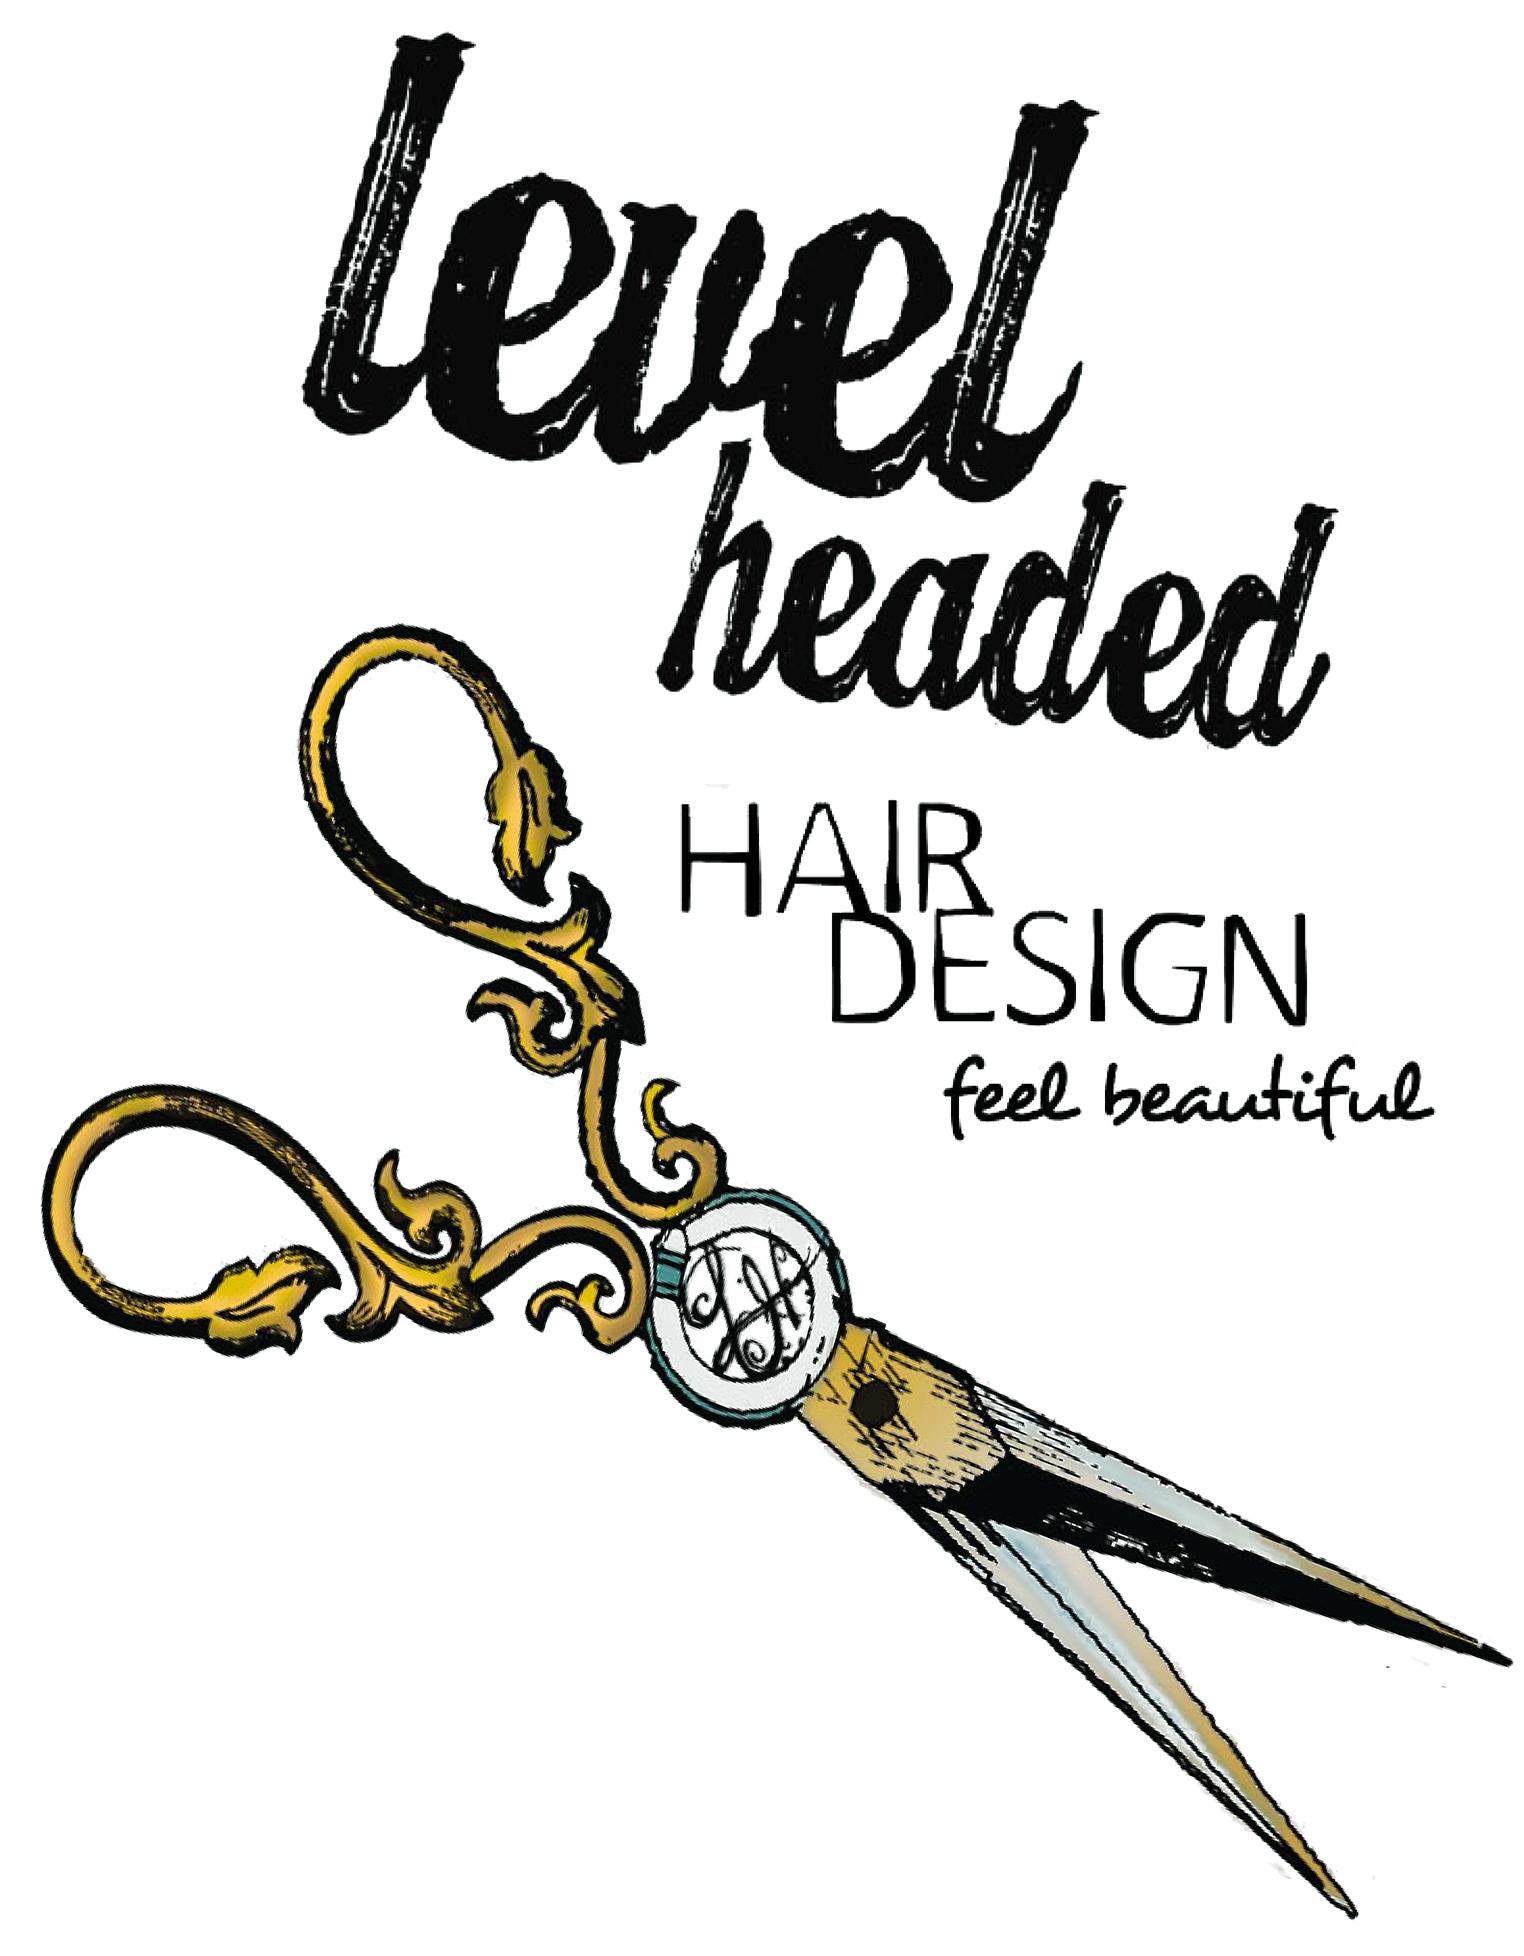 Level Headed Hair Design